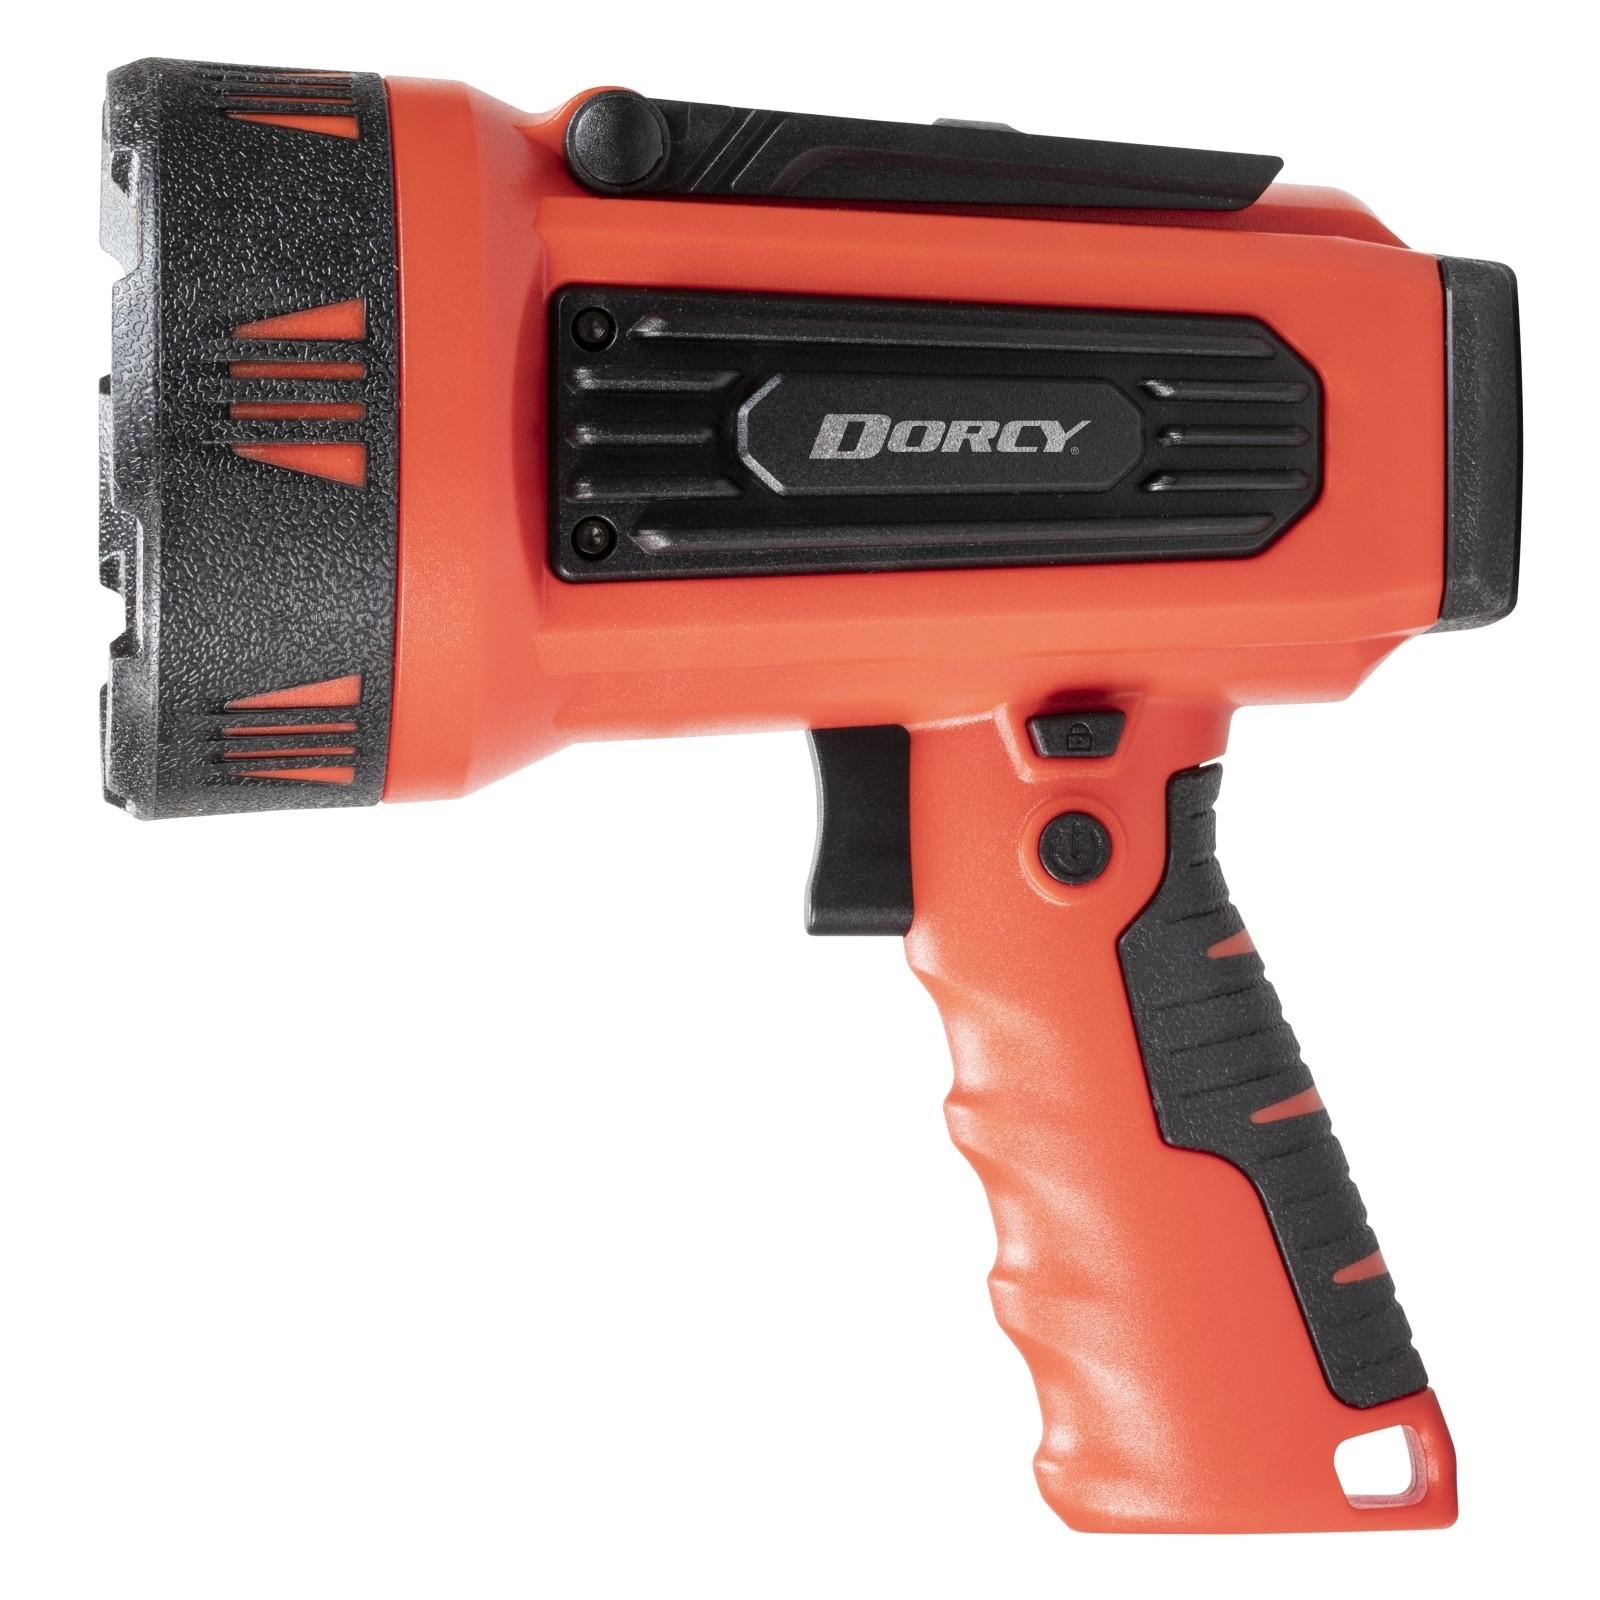 Dorcy 41-4356: Ultra USB Rechargeable 1300 Lumen Spotlight